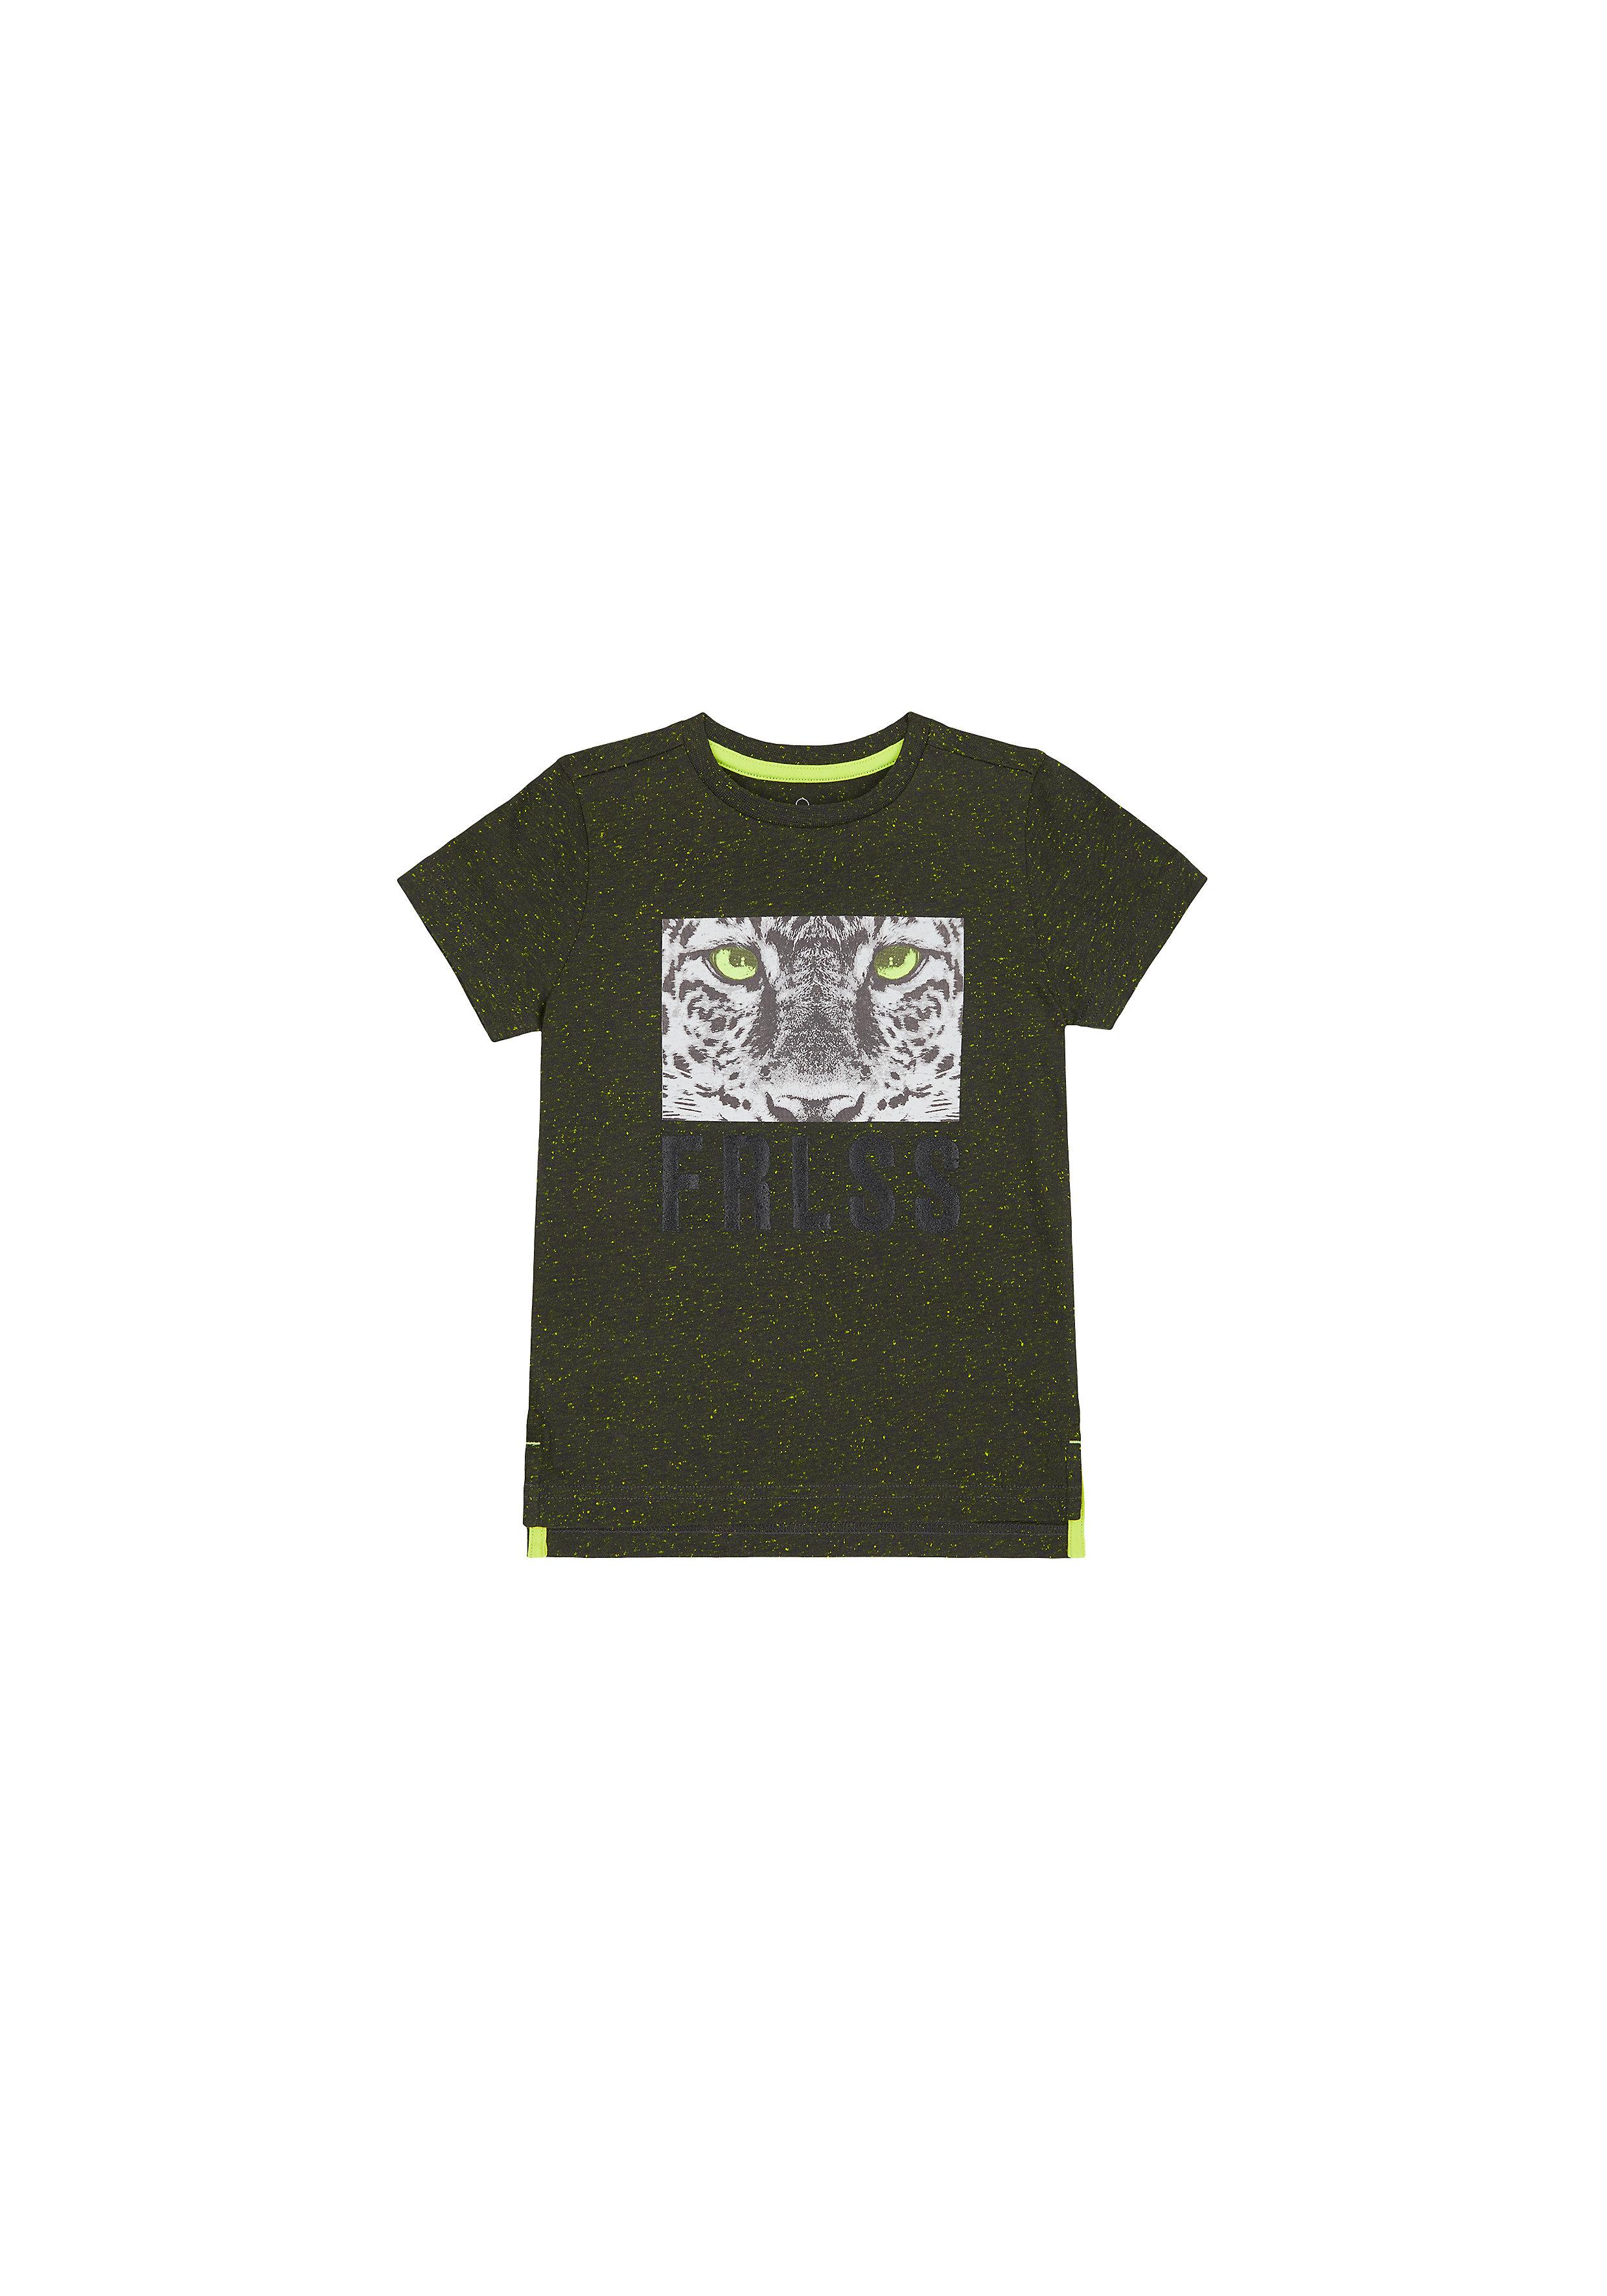 Mothercare | Boys Half Sleeves T-Shirt Leopard Print - Black